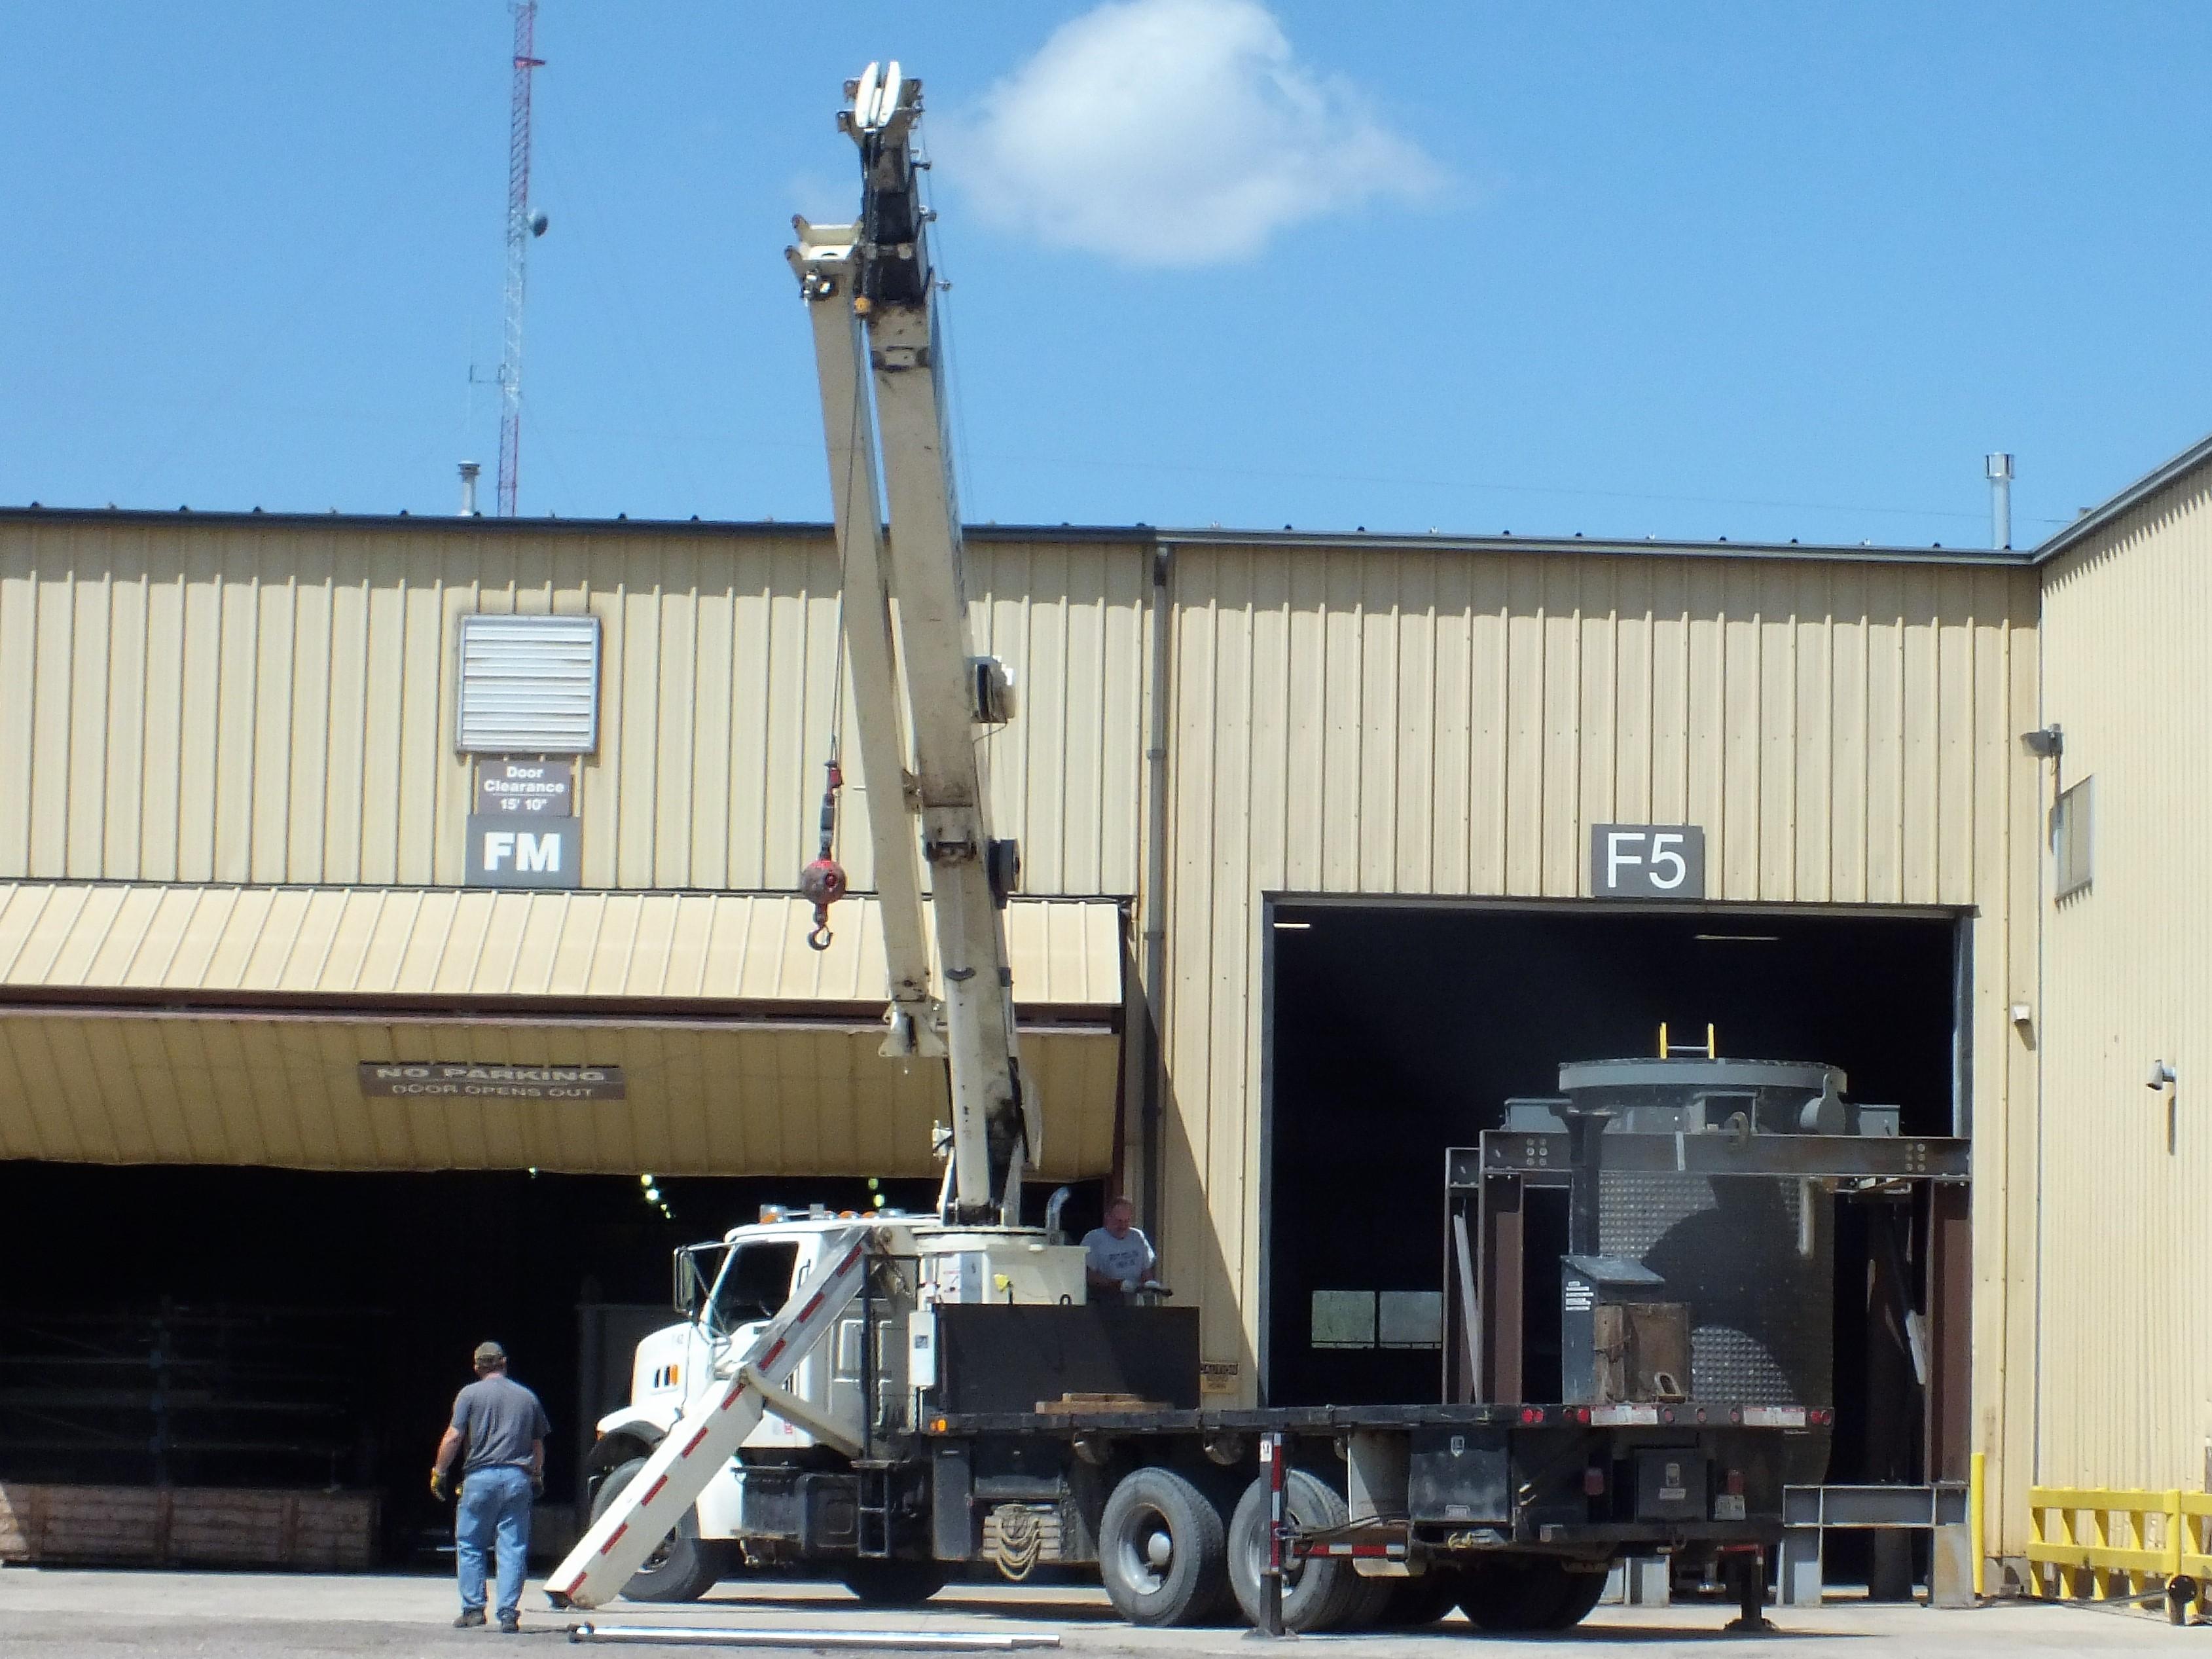 On Site Crane services